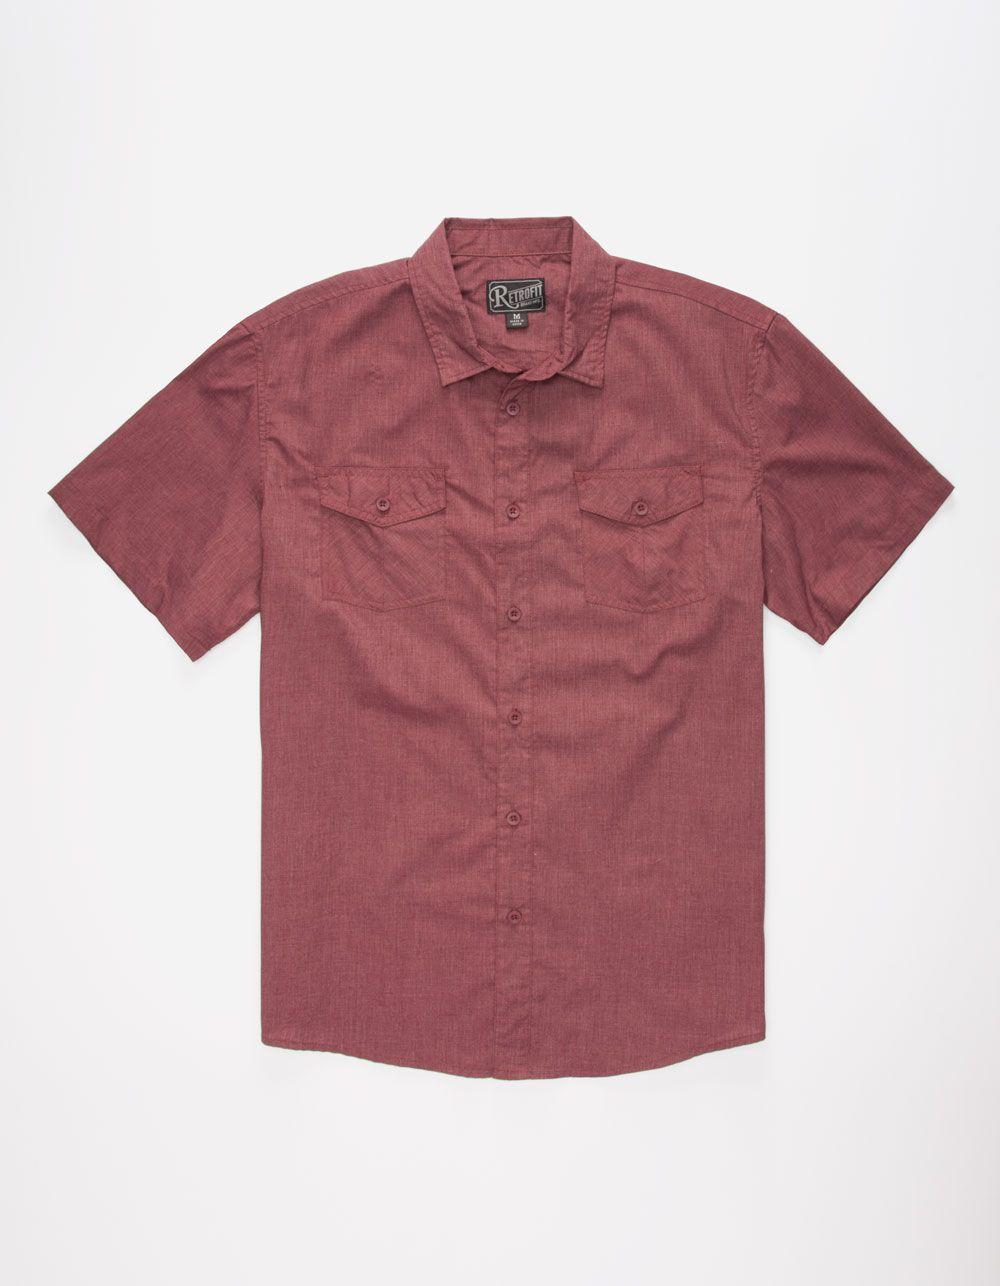 Flannel shirt with shorts men  RETROFIT Ian Mens Shirt   SS Shirts  NEW ARRIVALS